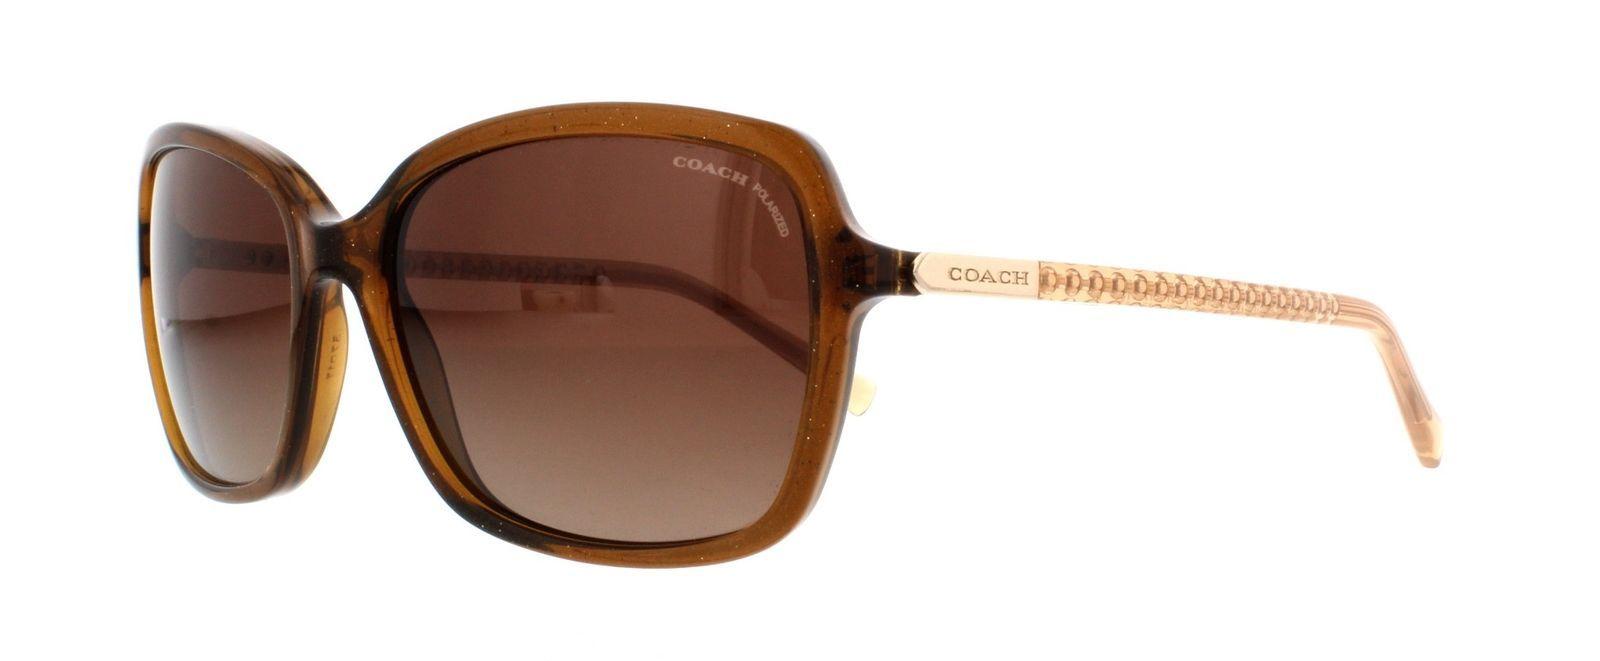 91ec639c486 Authentic Coach Sunglasses HC8152 5328 13 and 10 similar items